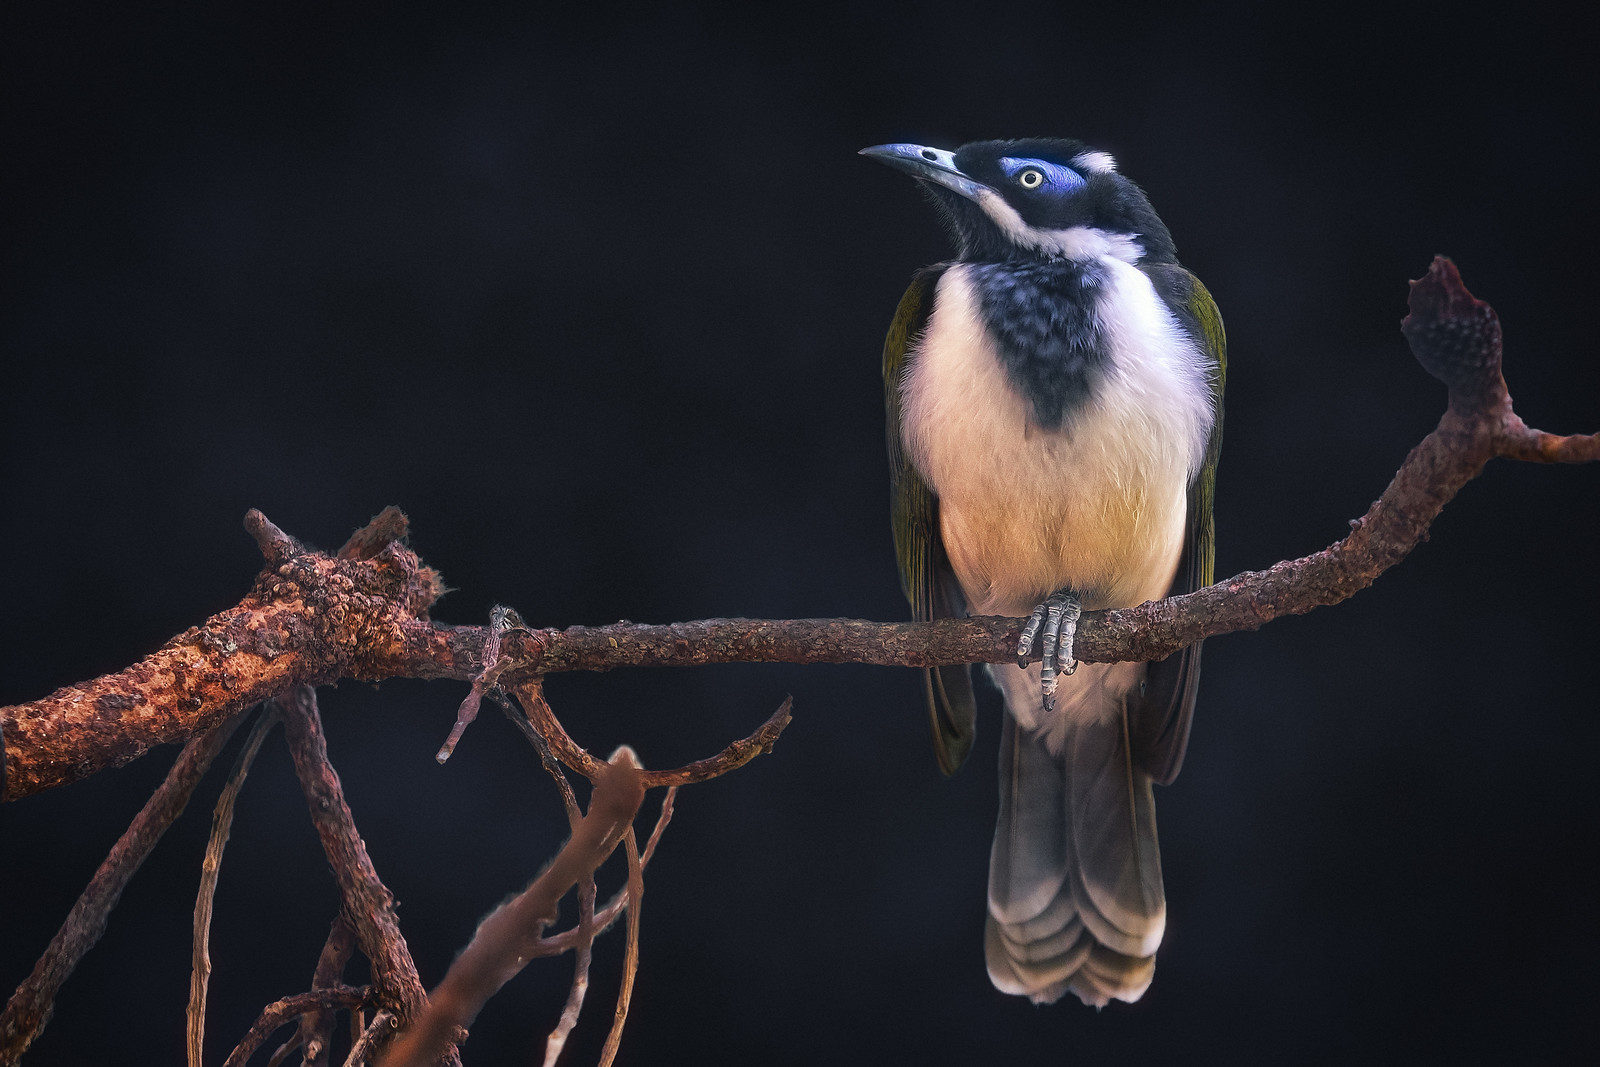 The Blue-faced Honeyeater Bird